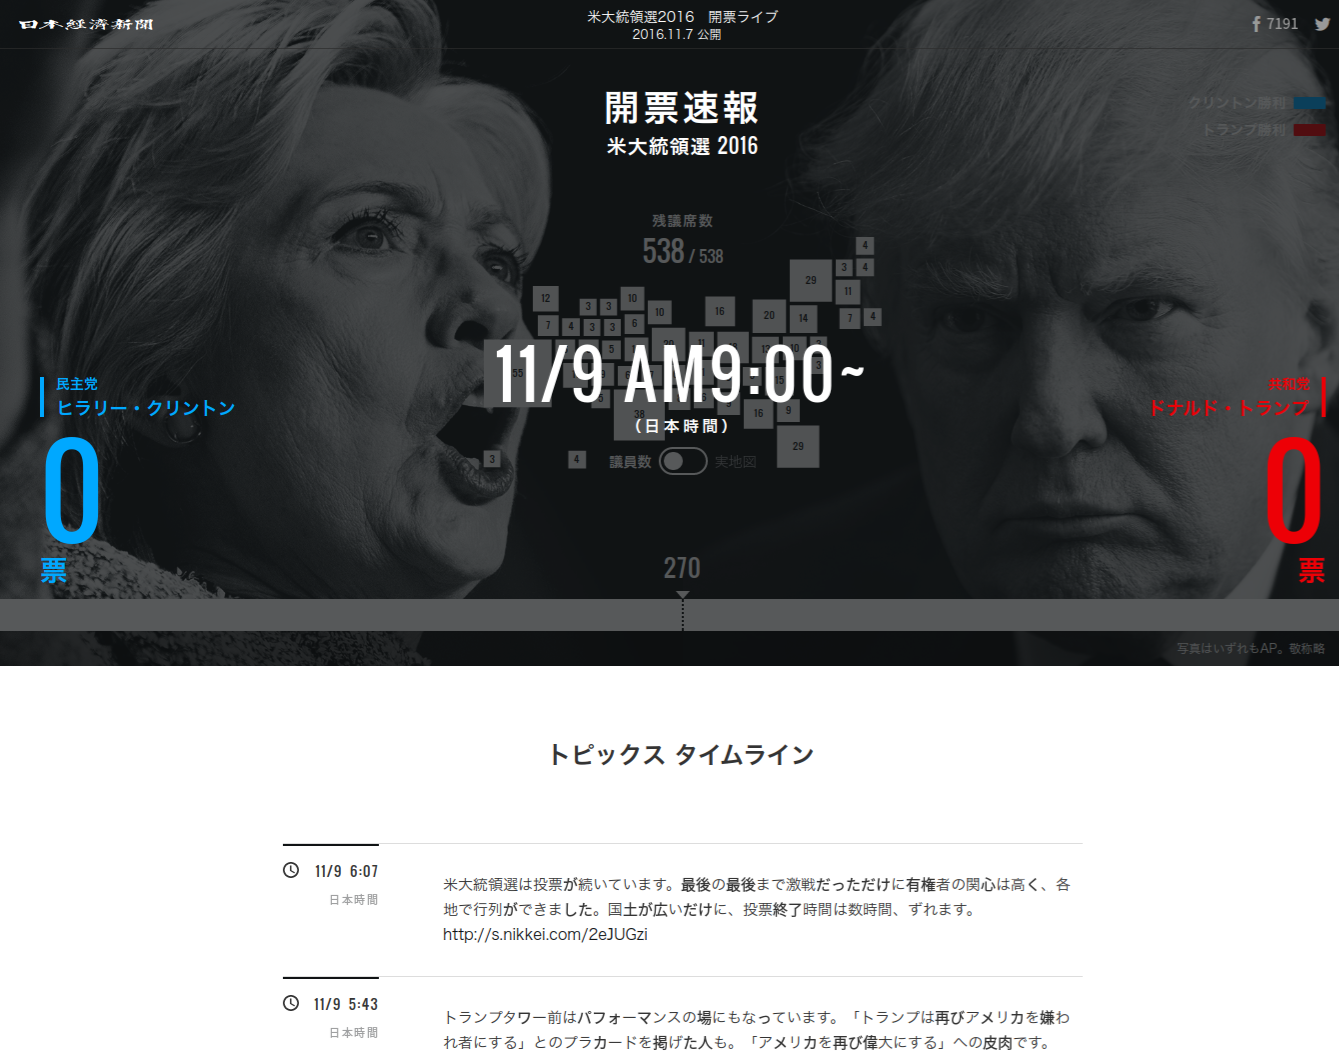 screencapture-vdata-nikkei-newsgraphics-president2016-live-1478639473706